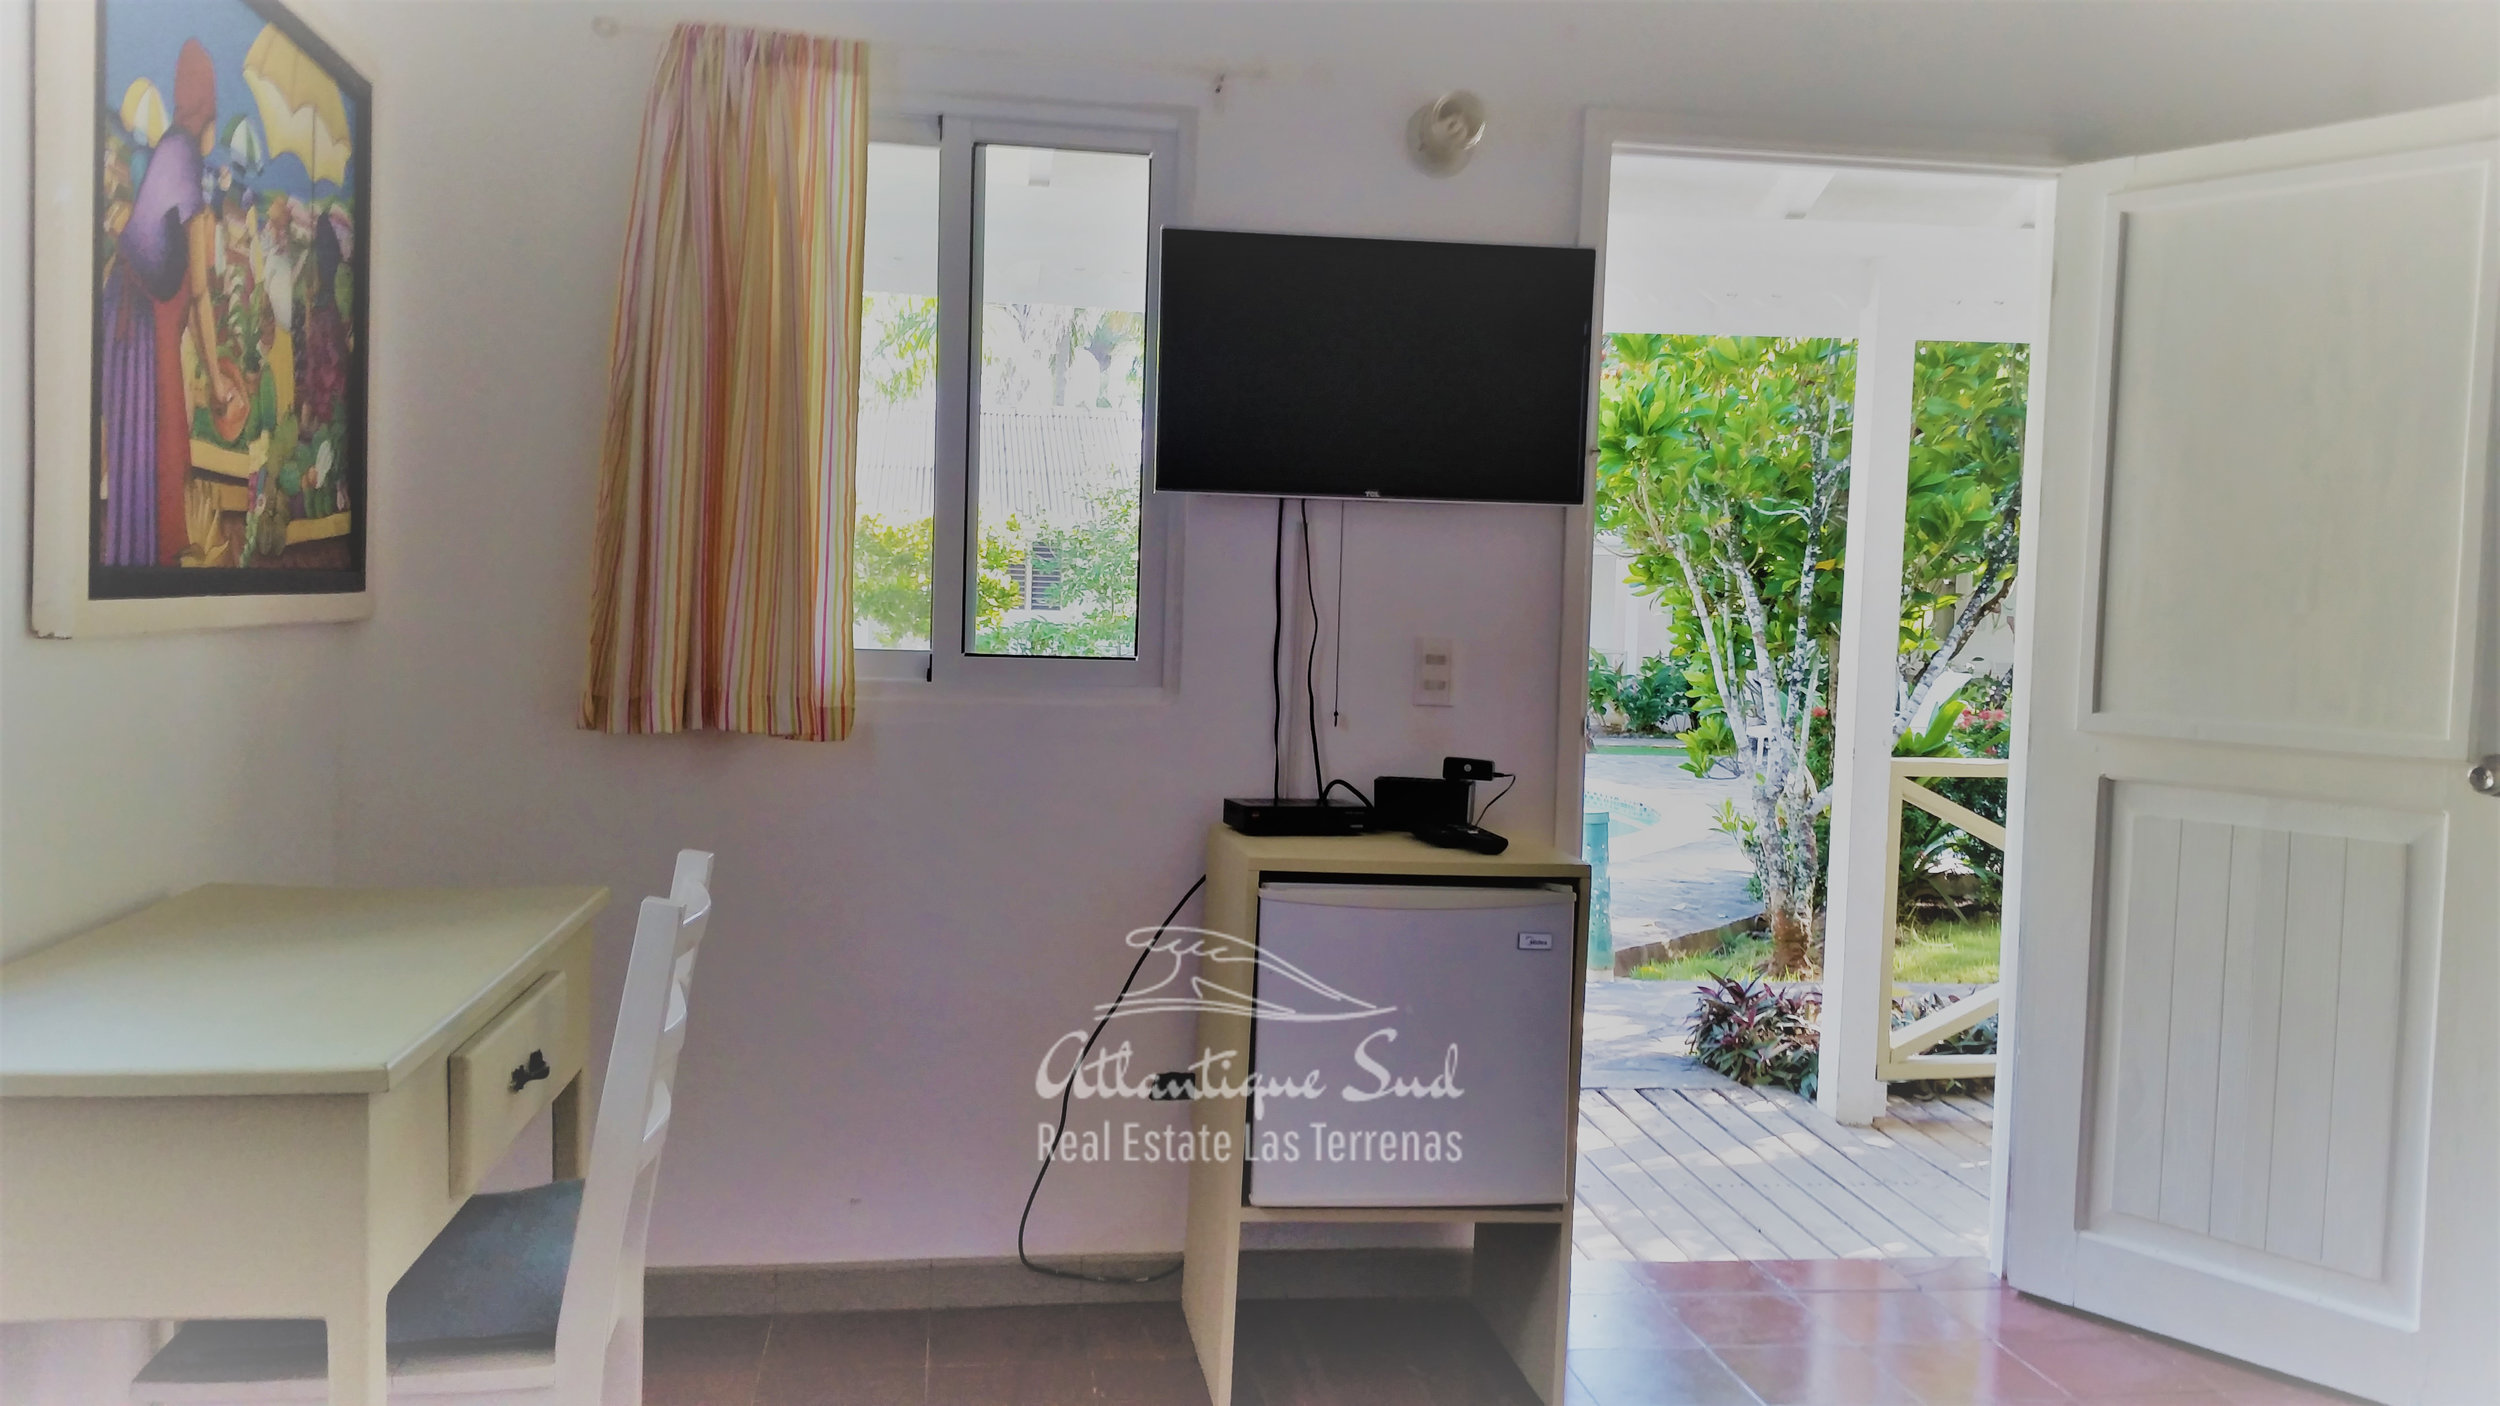 Small hotel for sale next to the beach Real Estate Las Terrenas Atlantique Sud Dominican Republic5.jpg